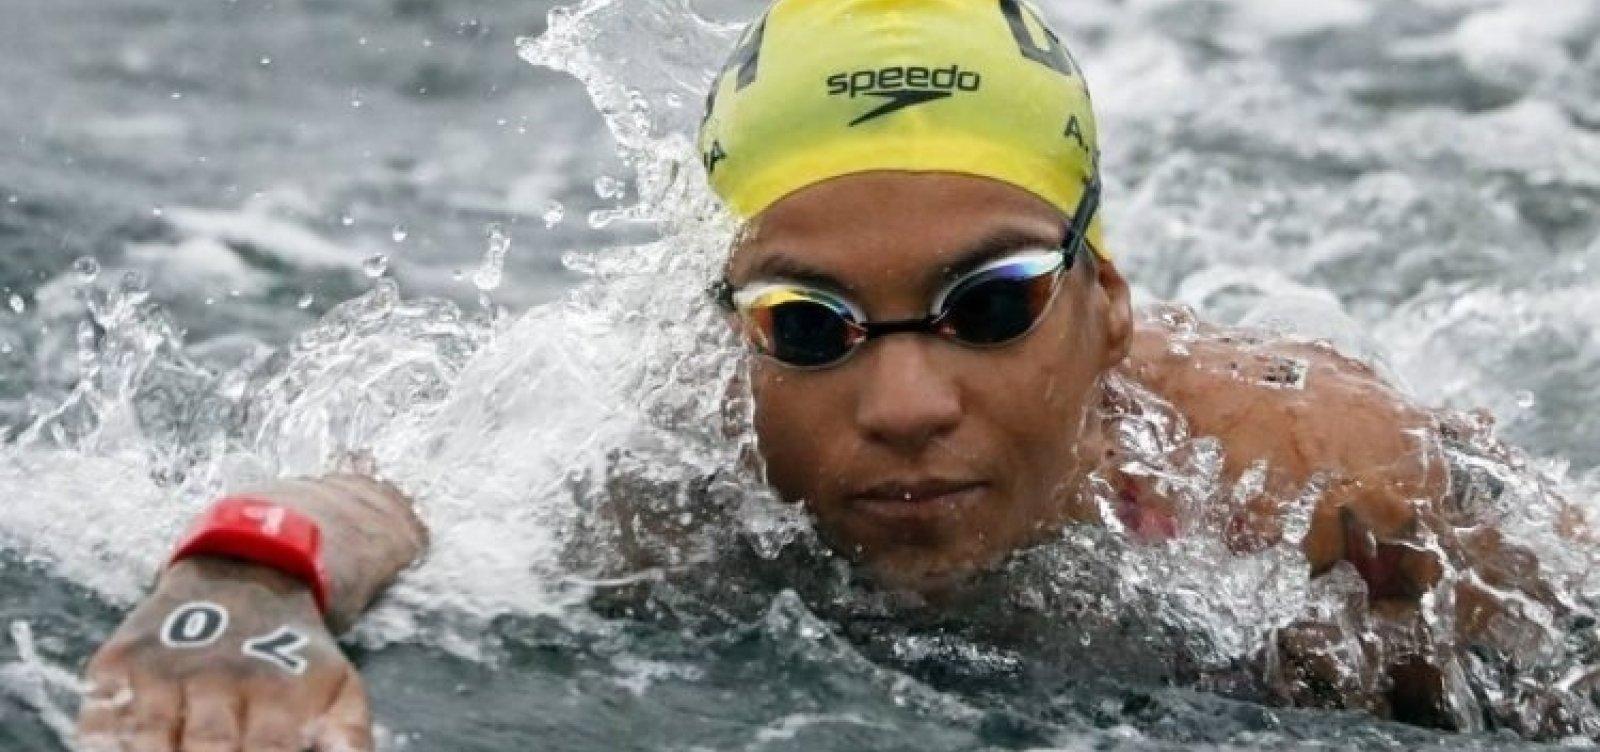 Ana Marcela vence prova em Inema e se classifica para Sul-Americano de 2020